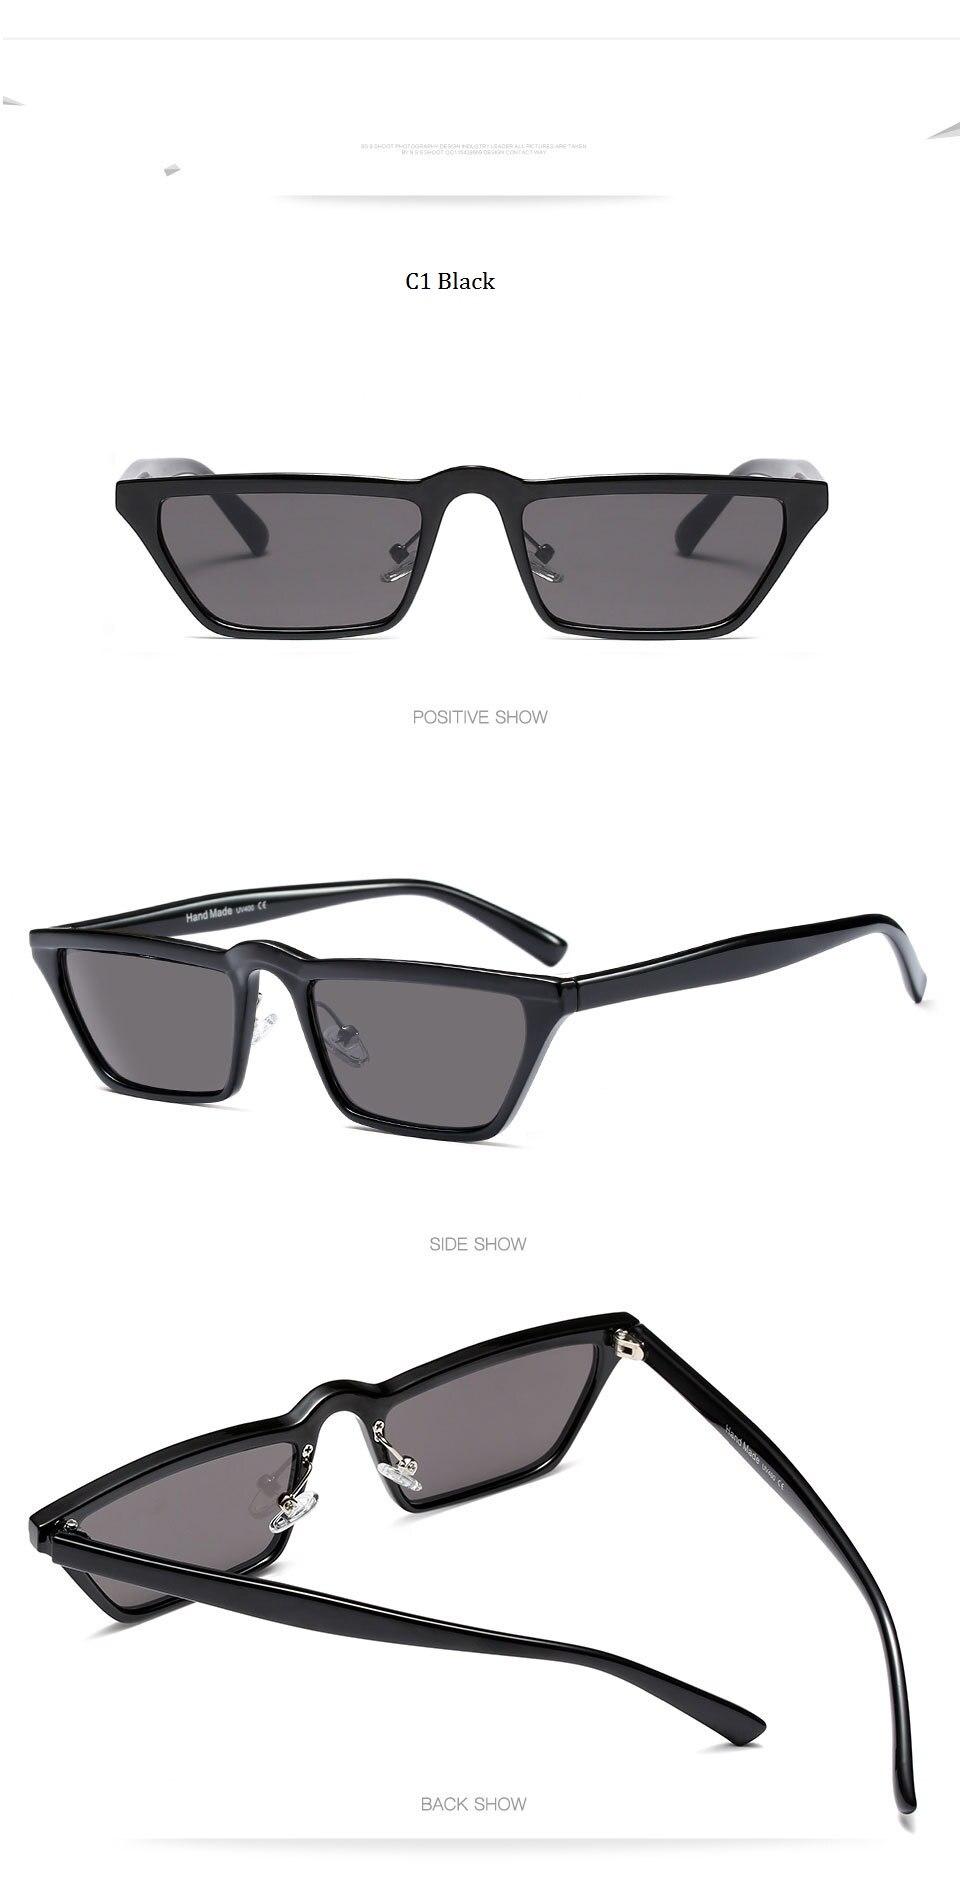 Desfiles de moda Tendência Mulheres Sexy Cool óculos de Sol Do ... eff9f92db1